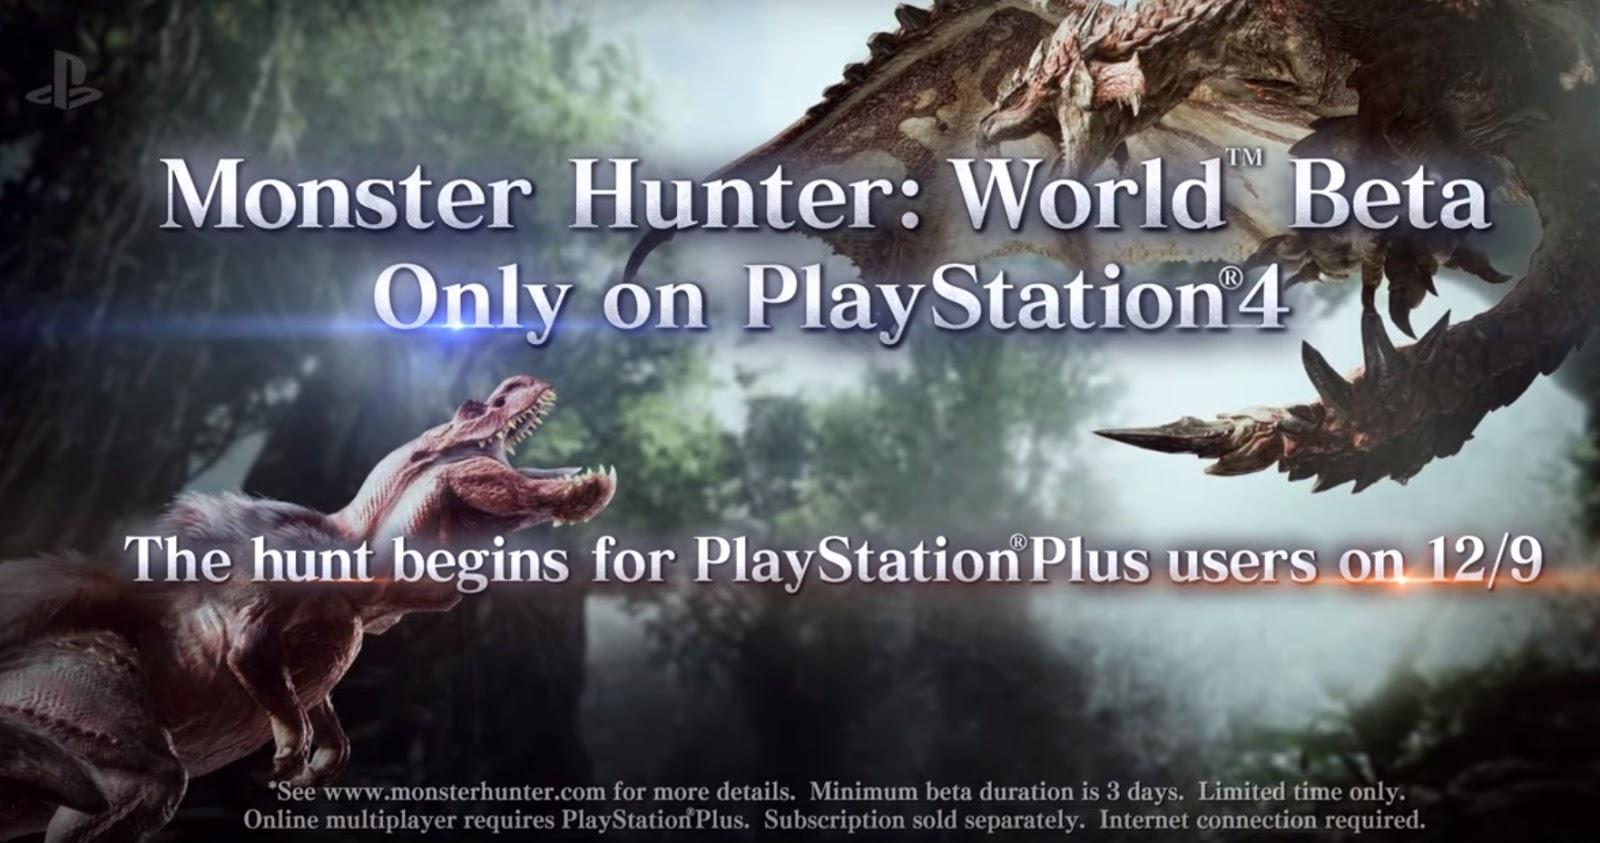 fuzzyLogic Gamer: Monster Hunter: World Beta Access and Hype!